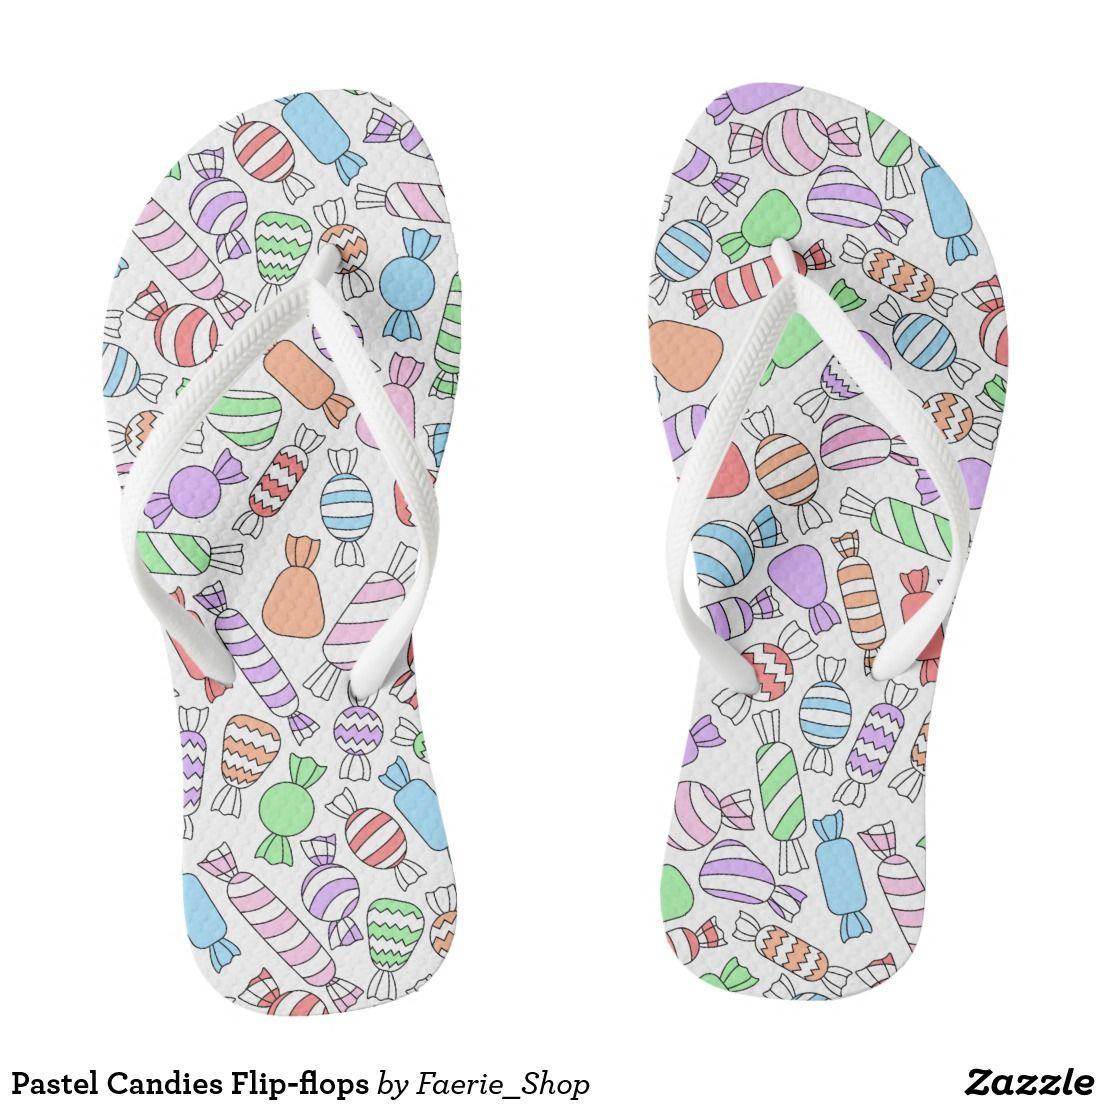 e0be714a16a9a8 Pastel Candies Flip-flops Flip Flops  faerieshop  watercolor  watercolour   candy  sweets  treats  pattern  beautiful  painting  decor  zazzle  present   gift ...